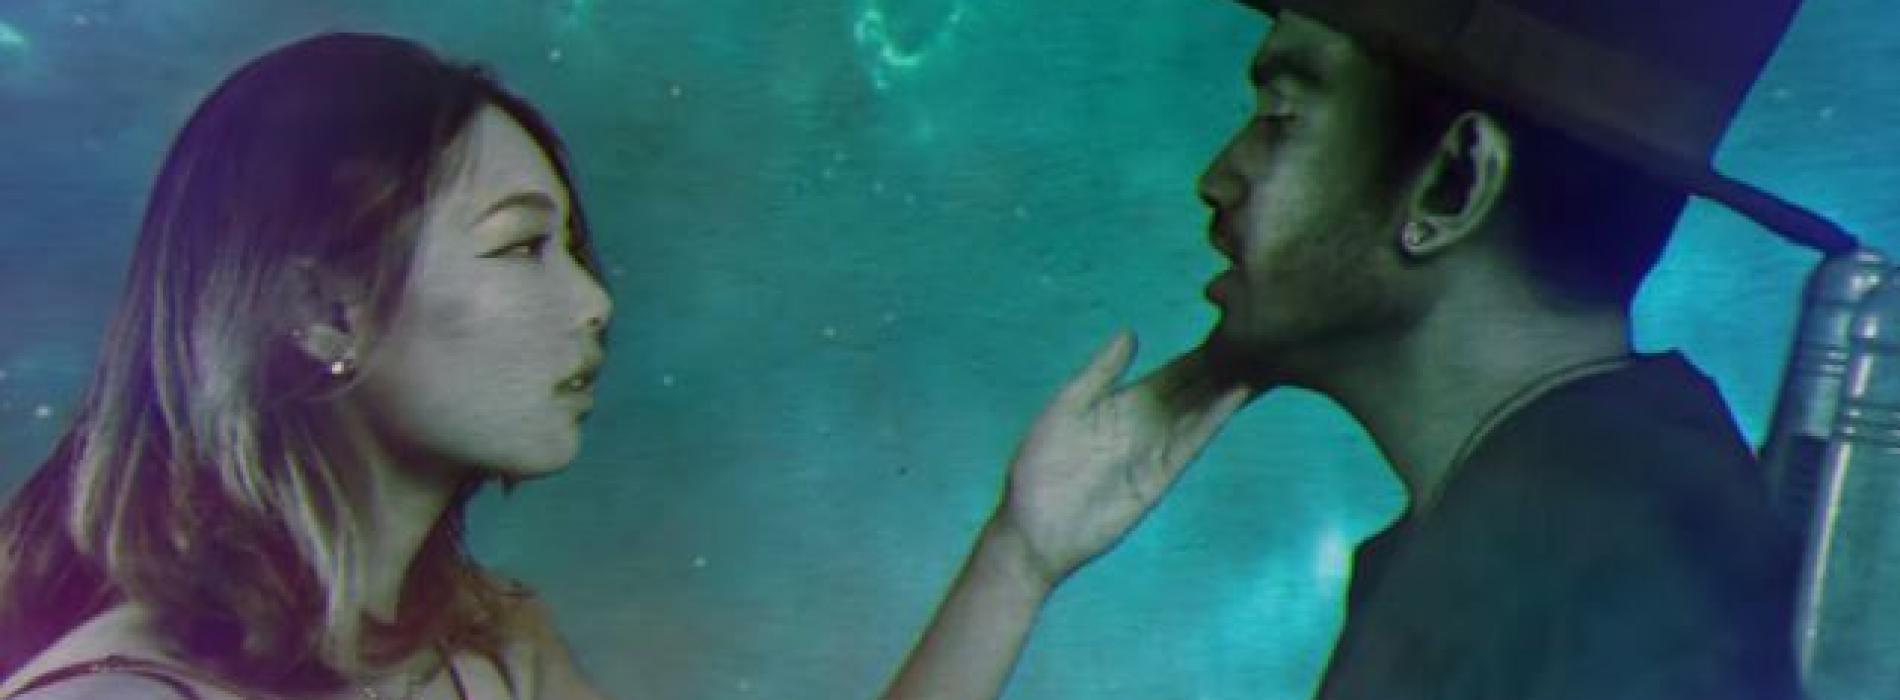 DKM – Nura Ragee (නුරා රාගී) | Official Music Video